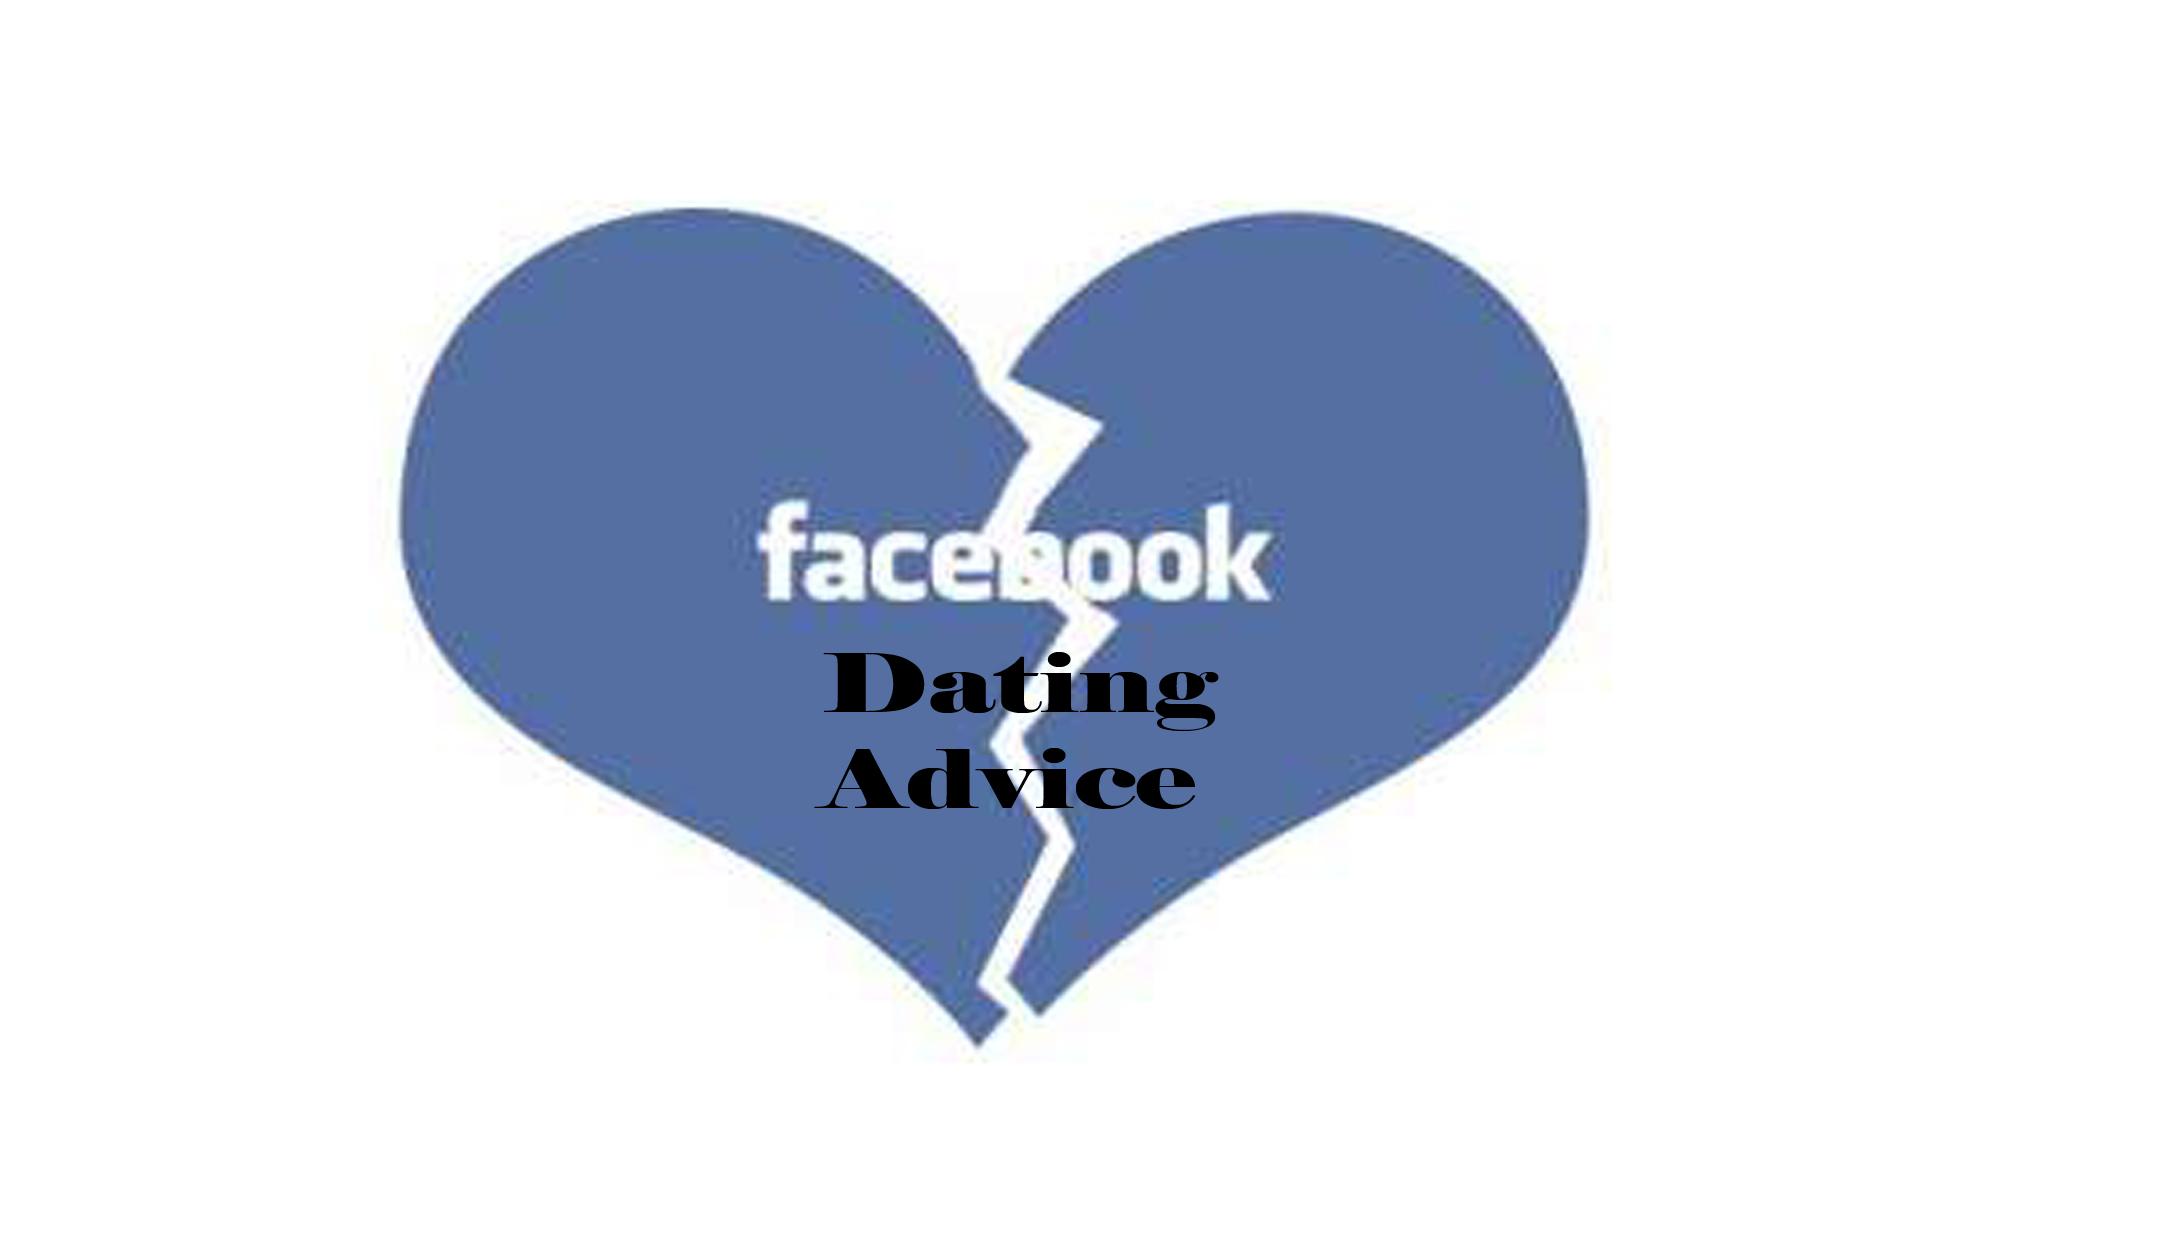 Facebook Dating Advice – Facebook Dating Feature